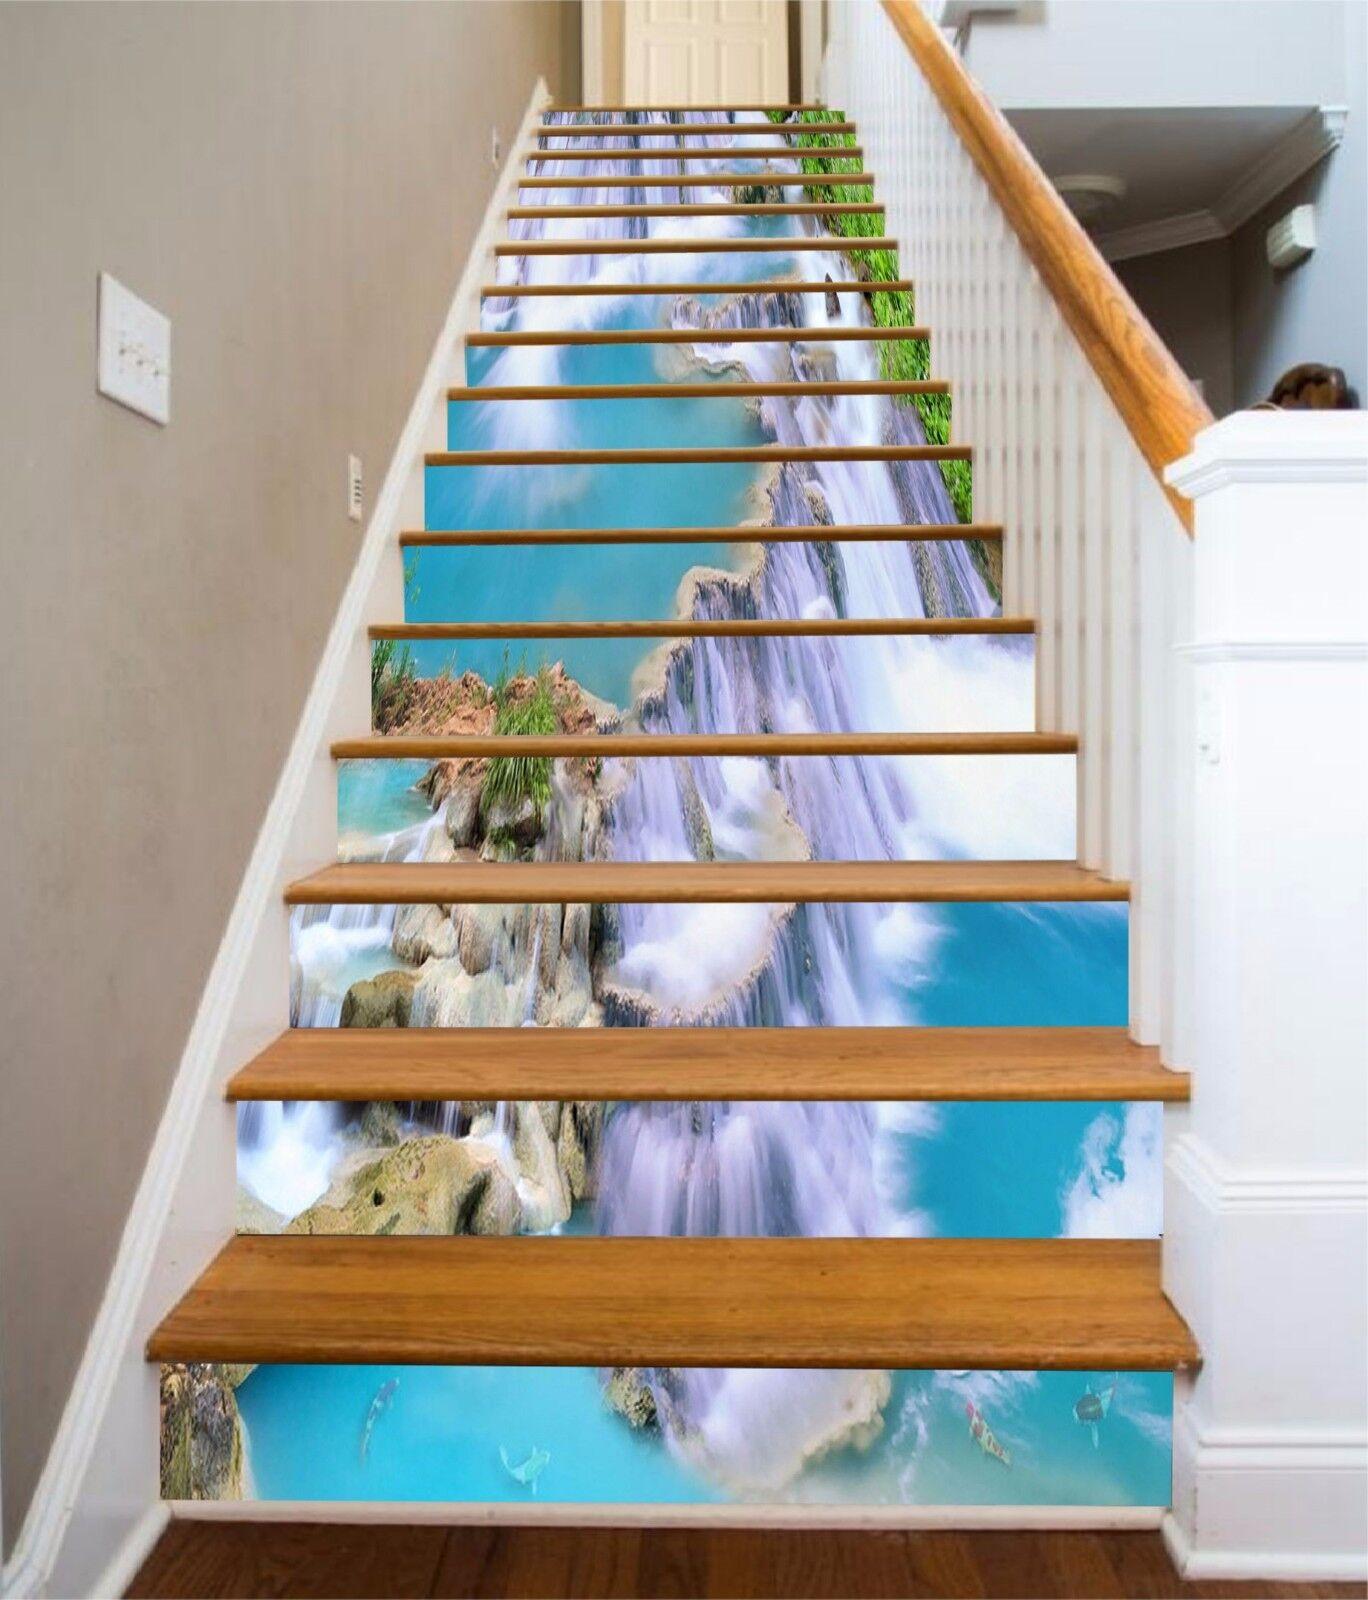 3D Waterfall 2537 Stair Risers Decoration Photo Mural Vinyl Decal Wallpaper UK